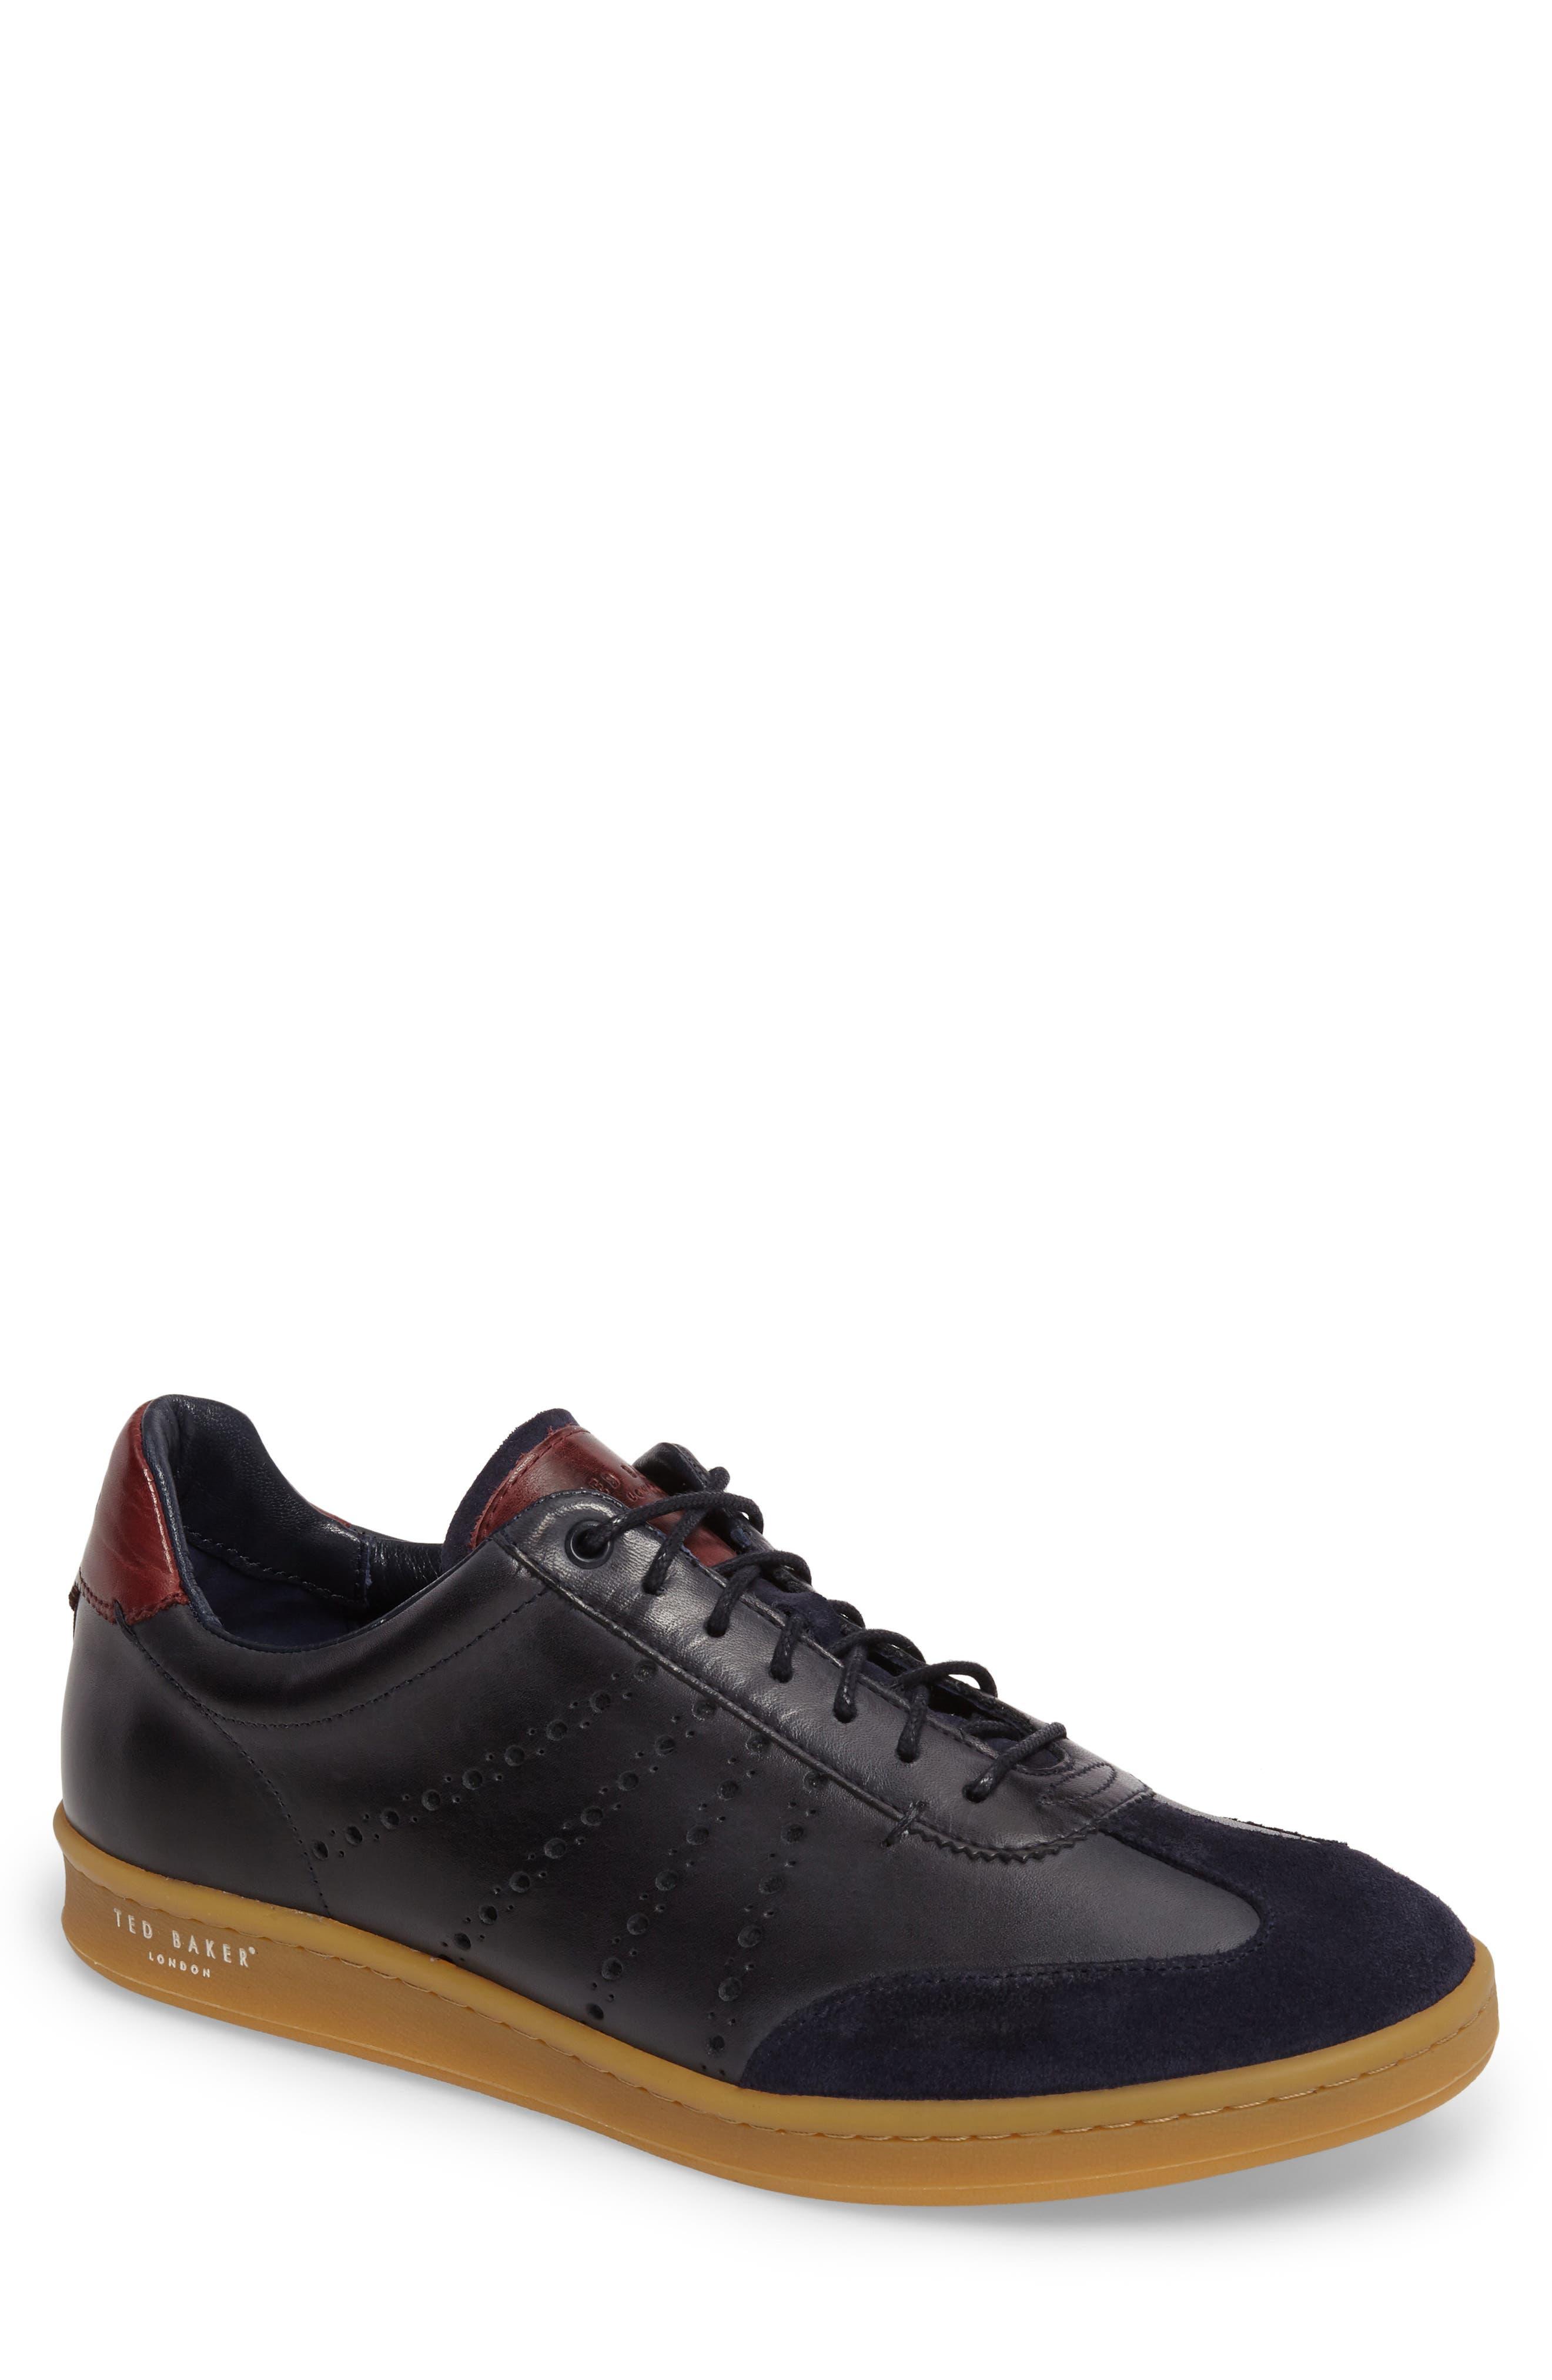 Alternate Image 1 Selected - Ted Baker London Orlee Sneaker (Men)